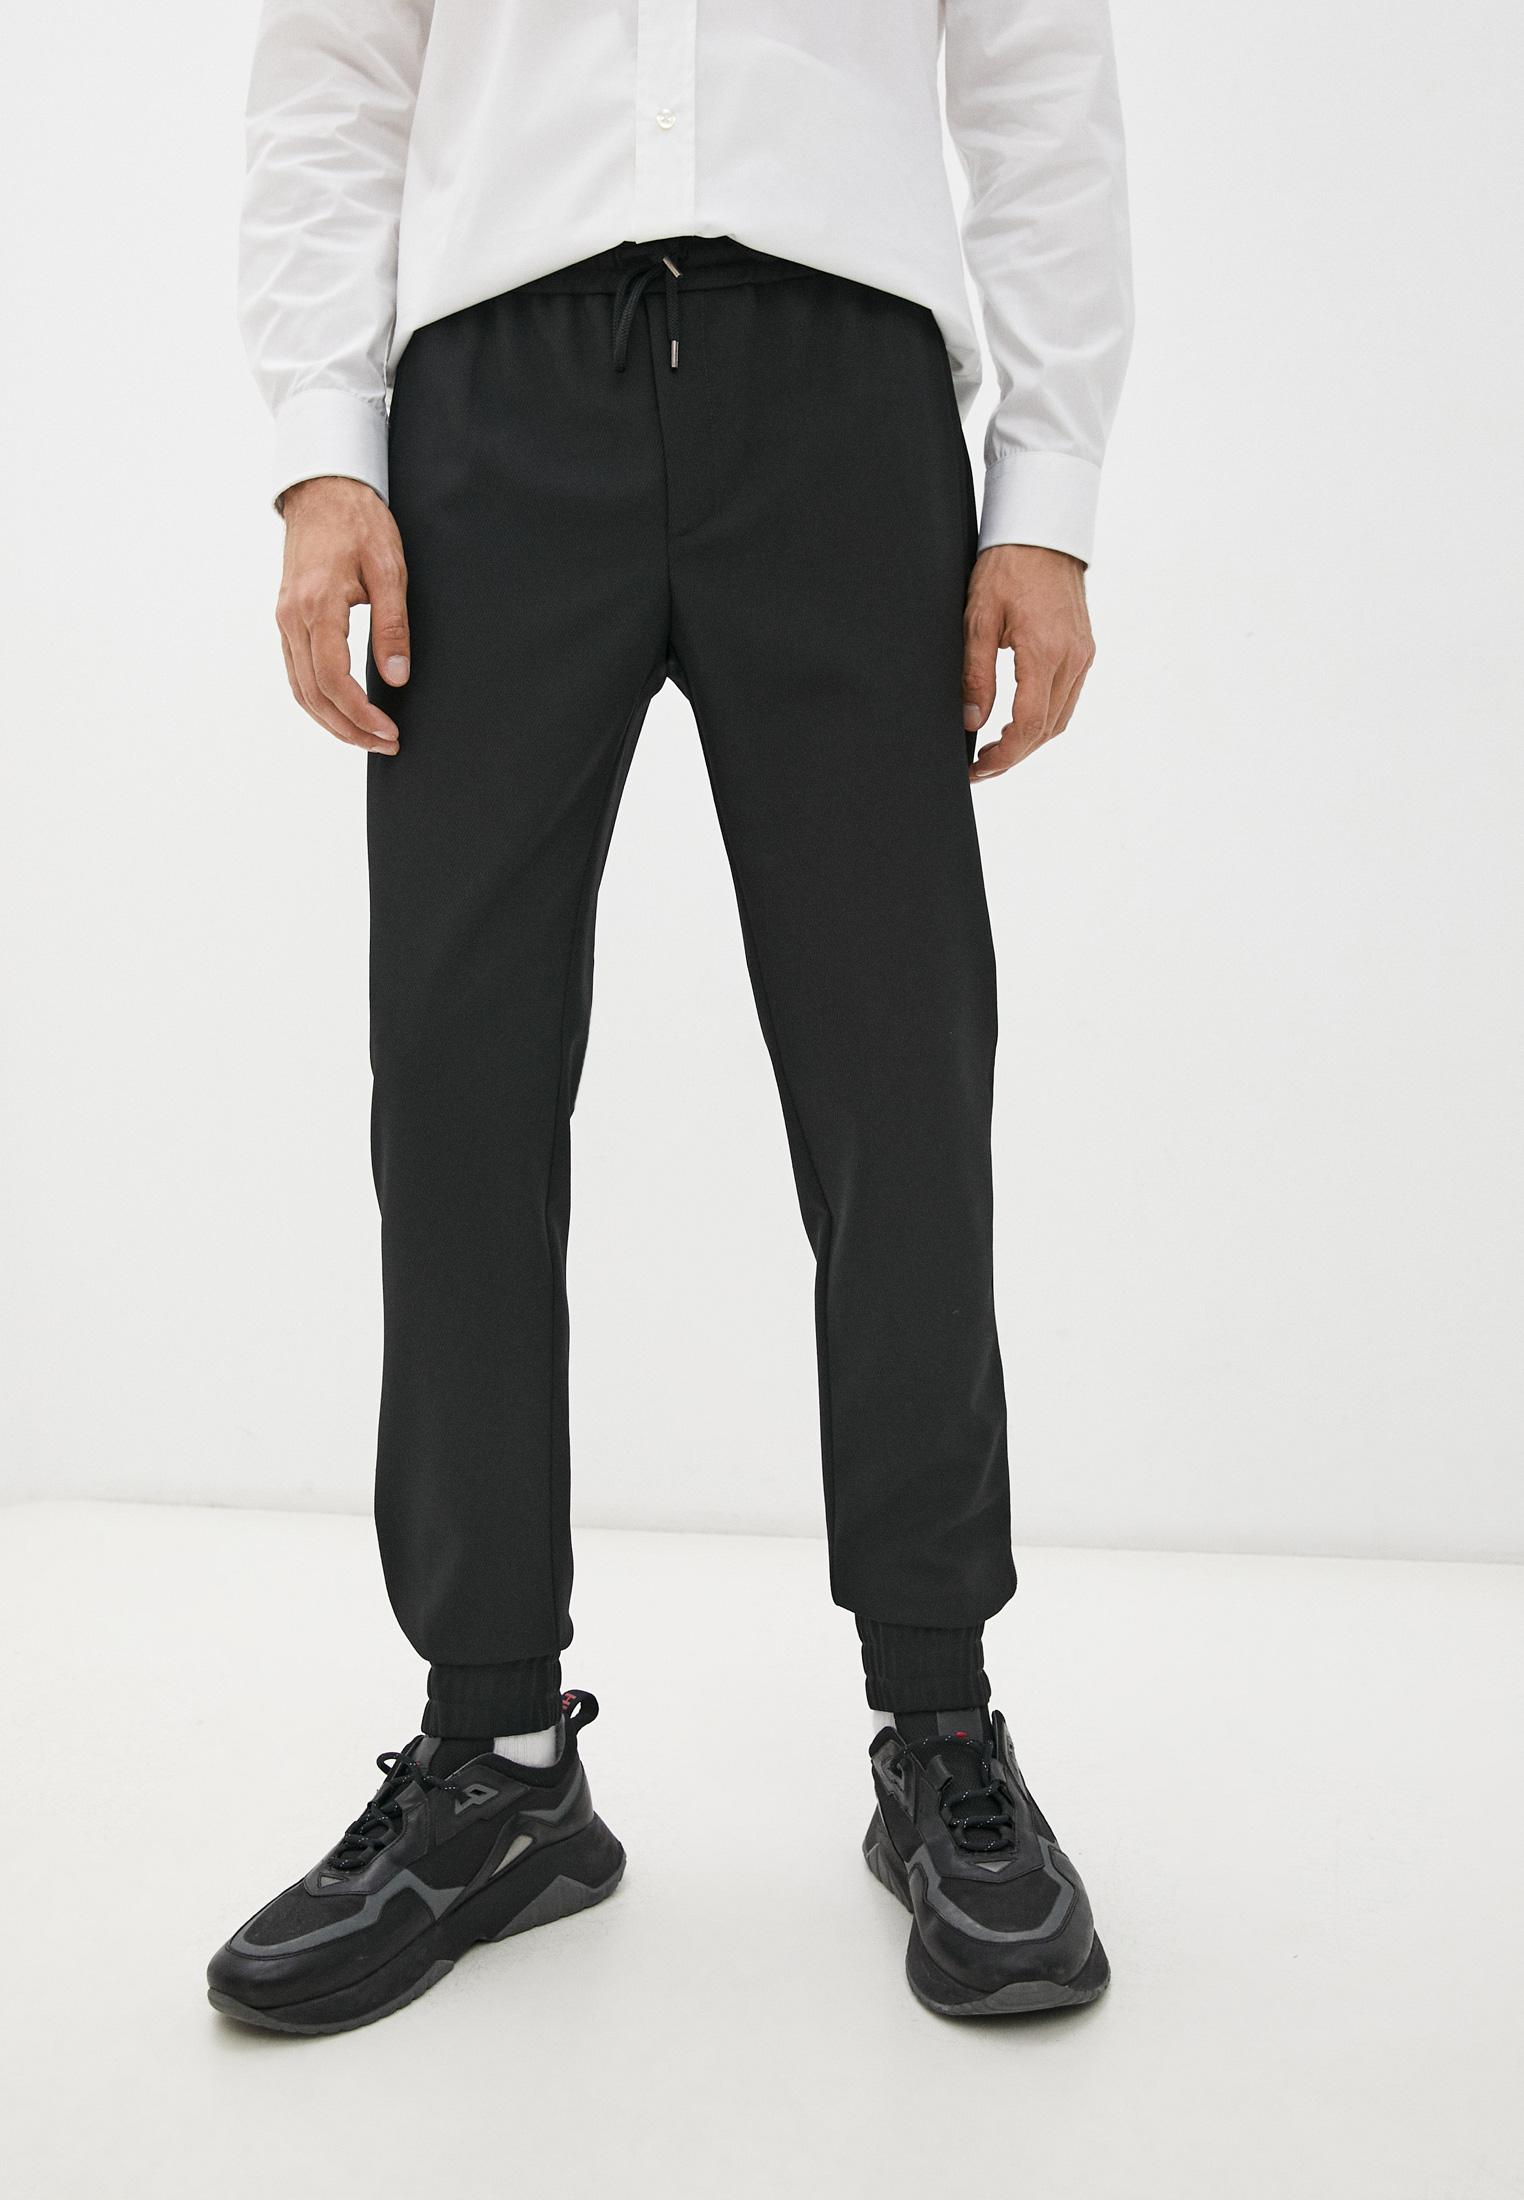 Мужские повседневные брюки Bikkembergs (Биккембергс) C P 012 01 S 2917